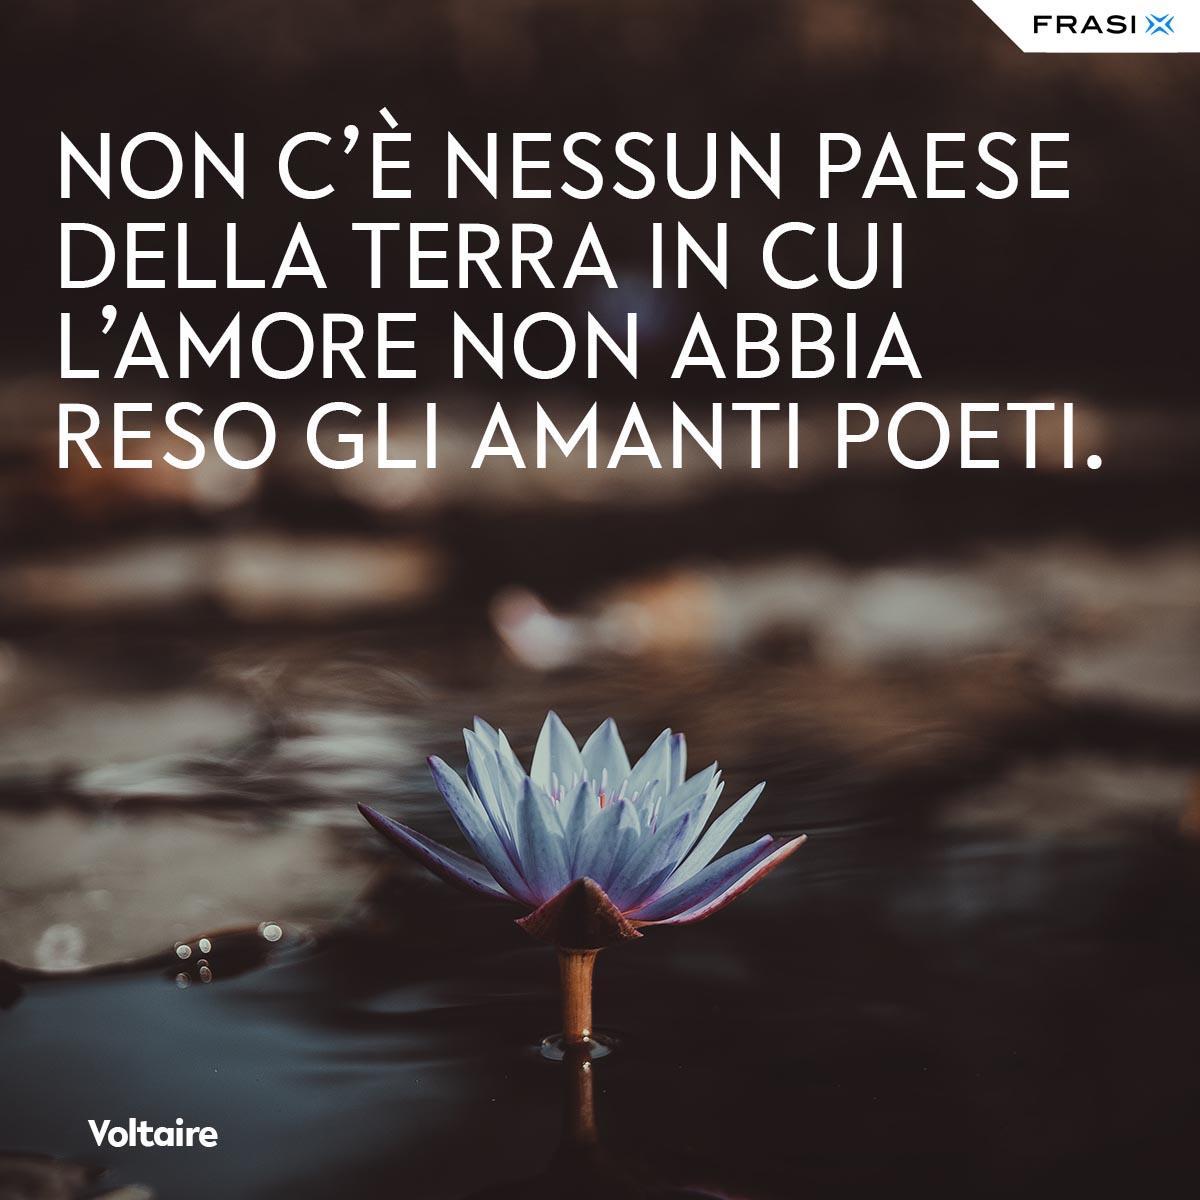 Frasi tumblr Voltaire